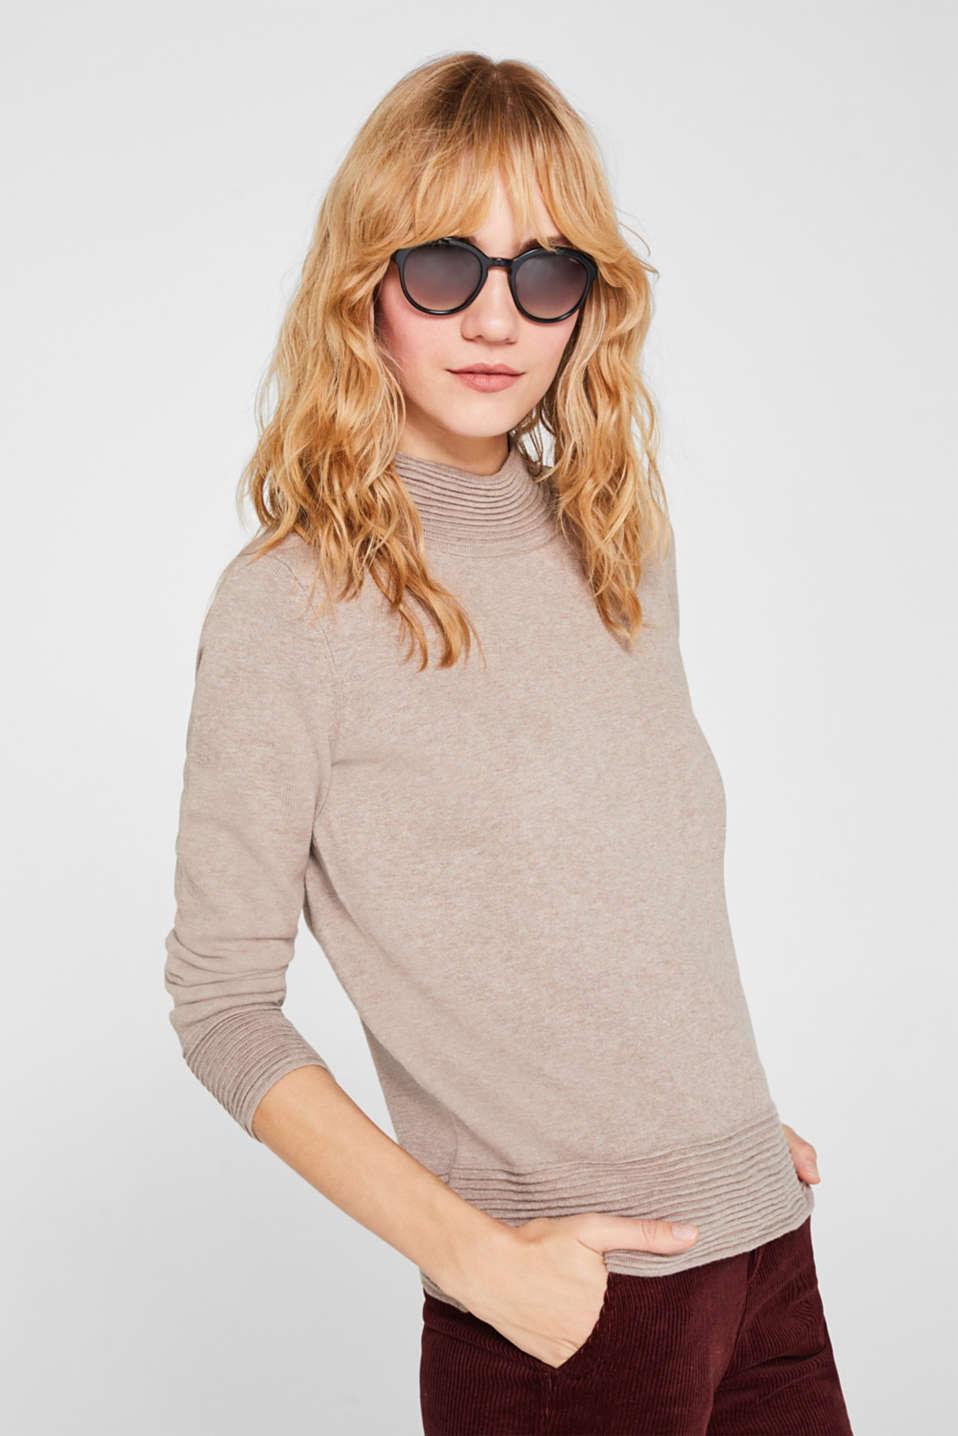 100% biodegradable sunglasses, BLACK, detail image number 2